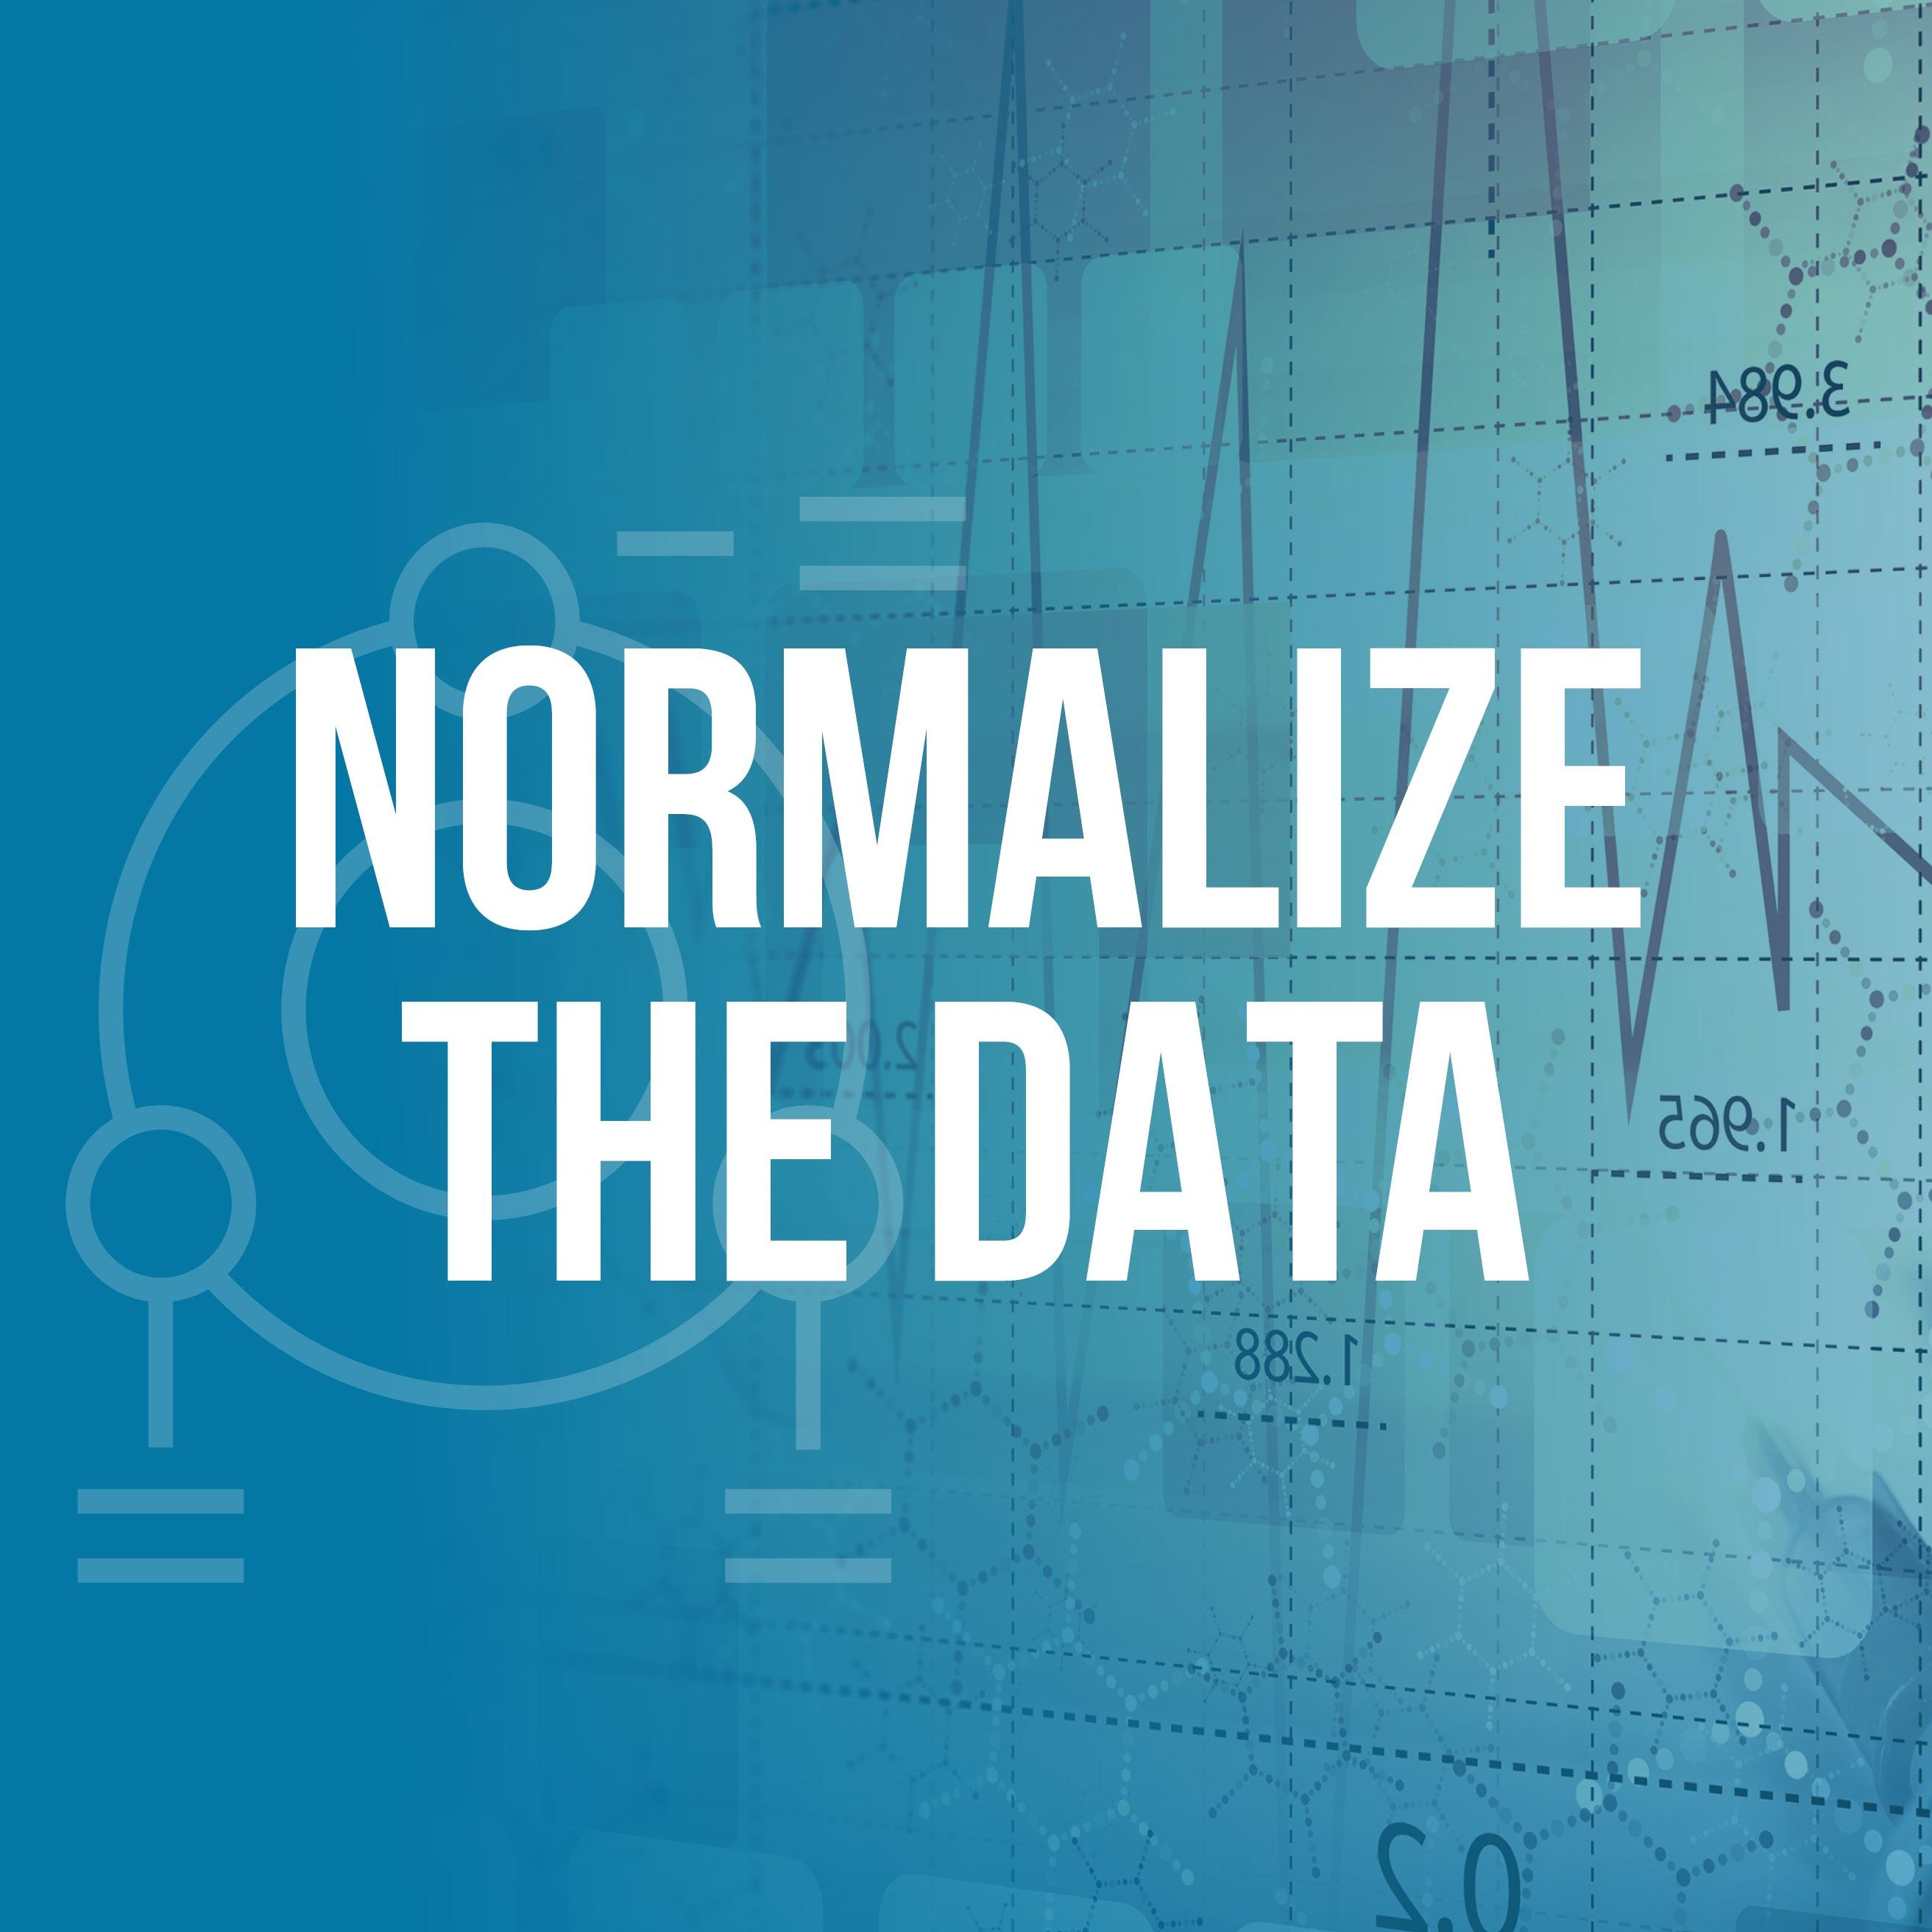 3 Normalize the Data - Square